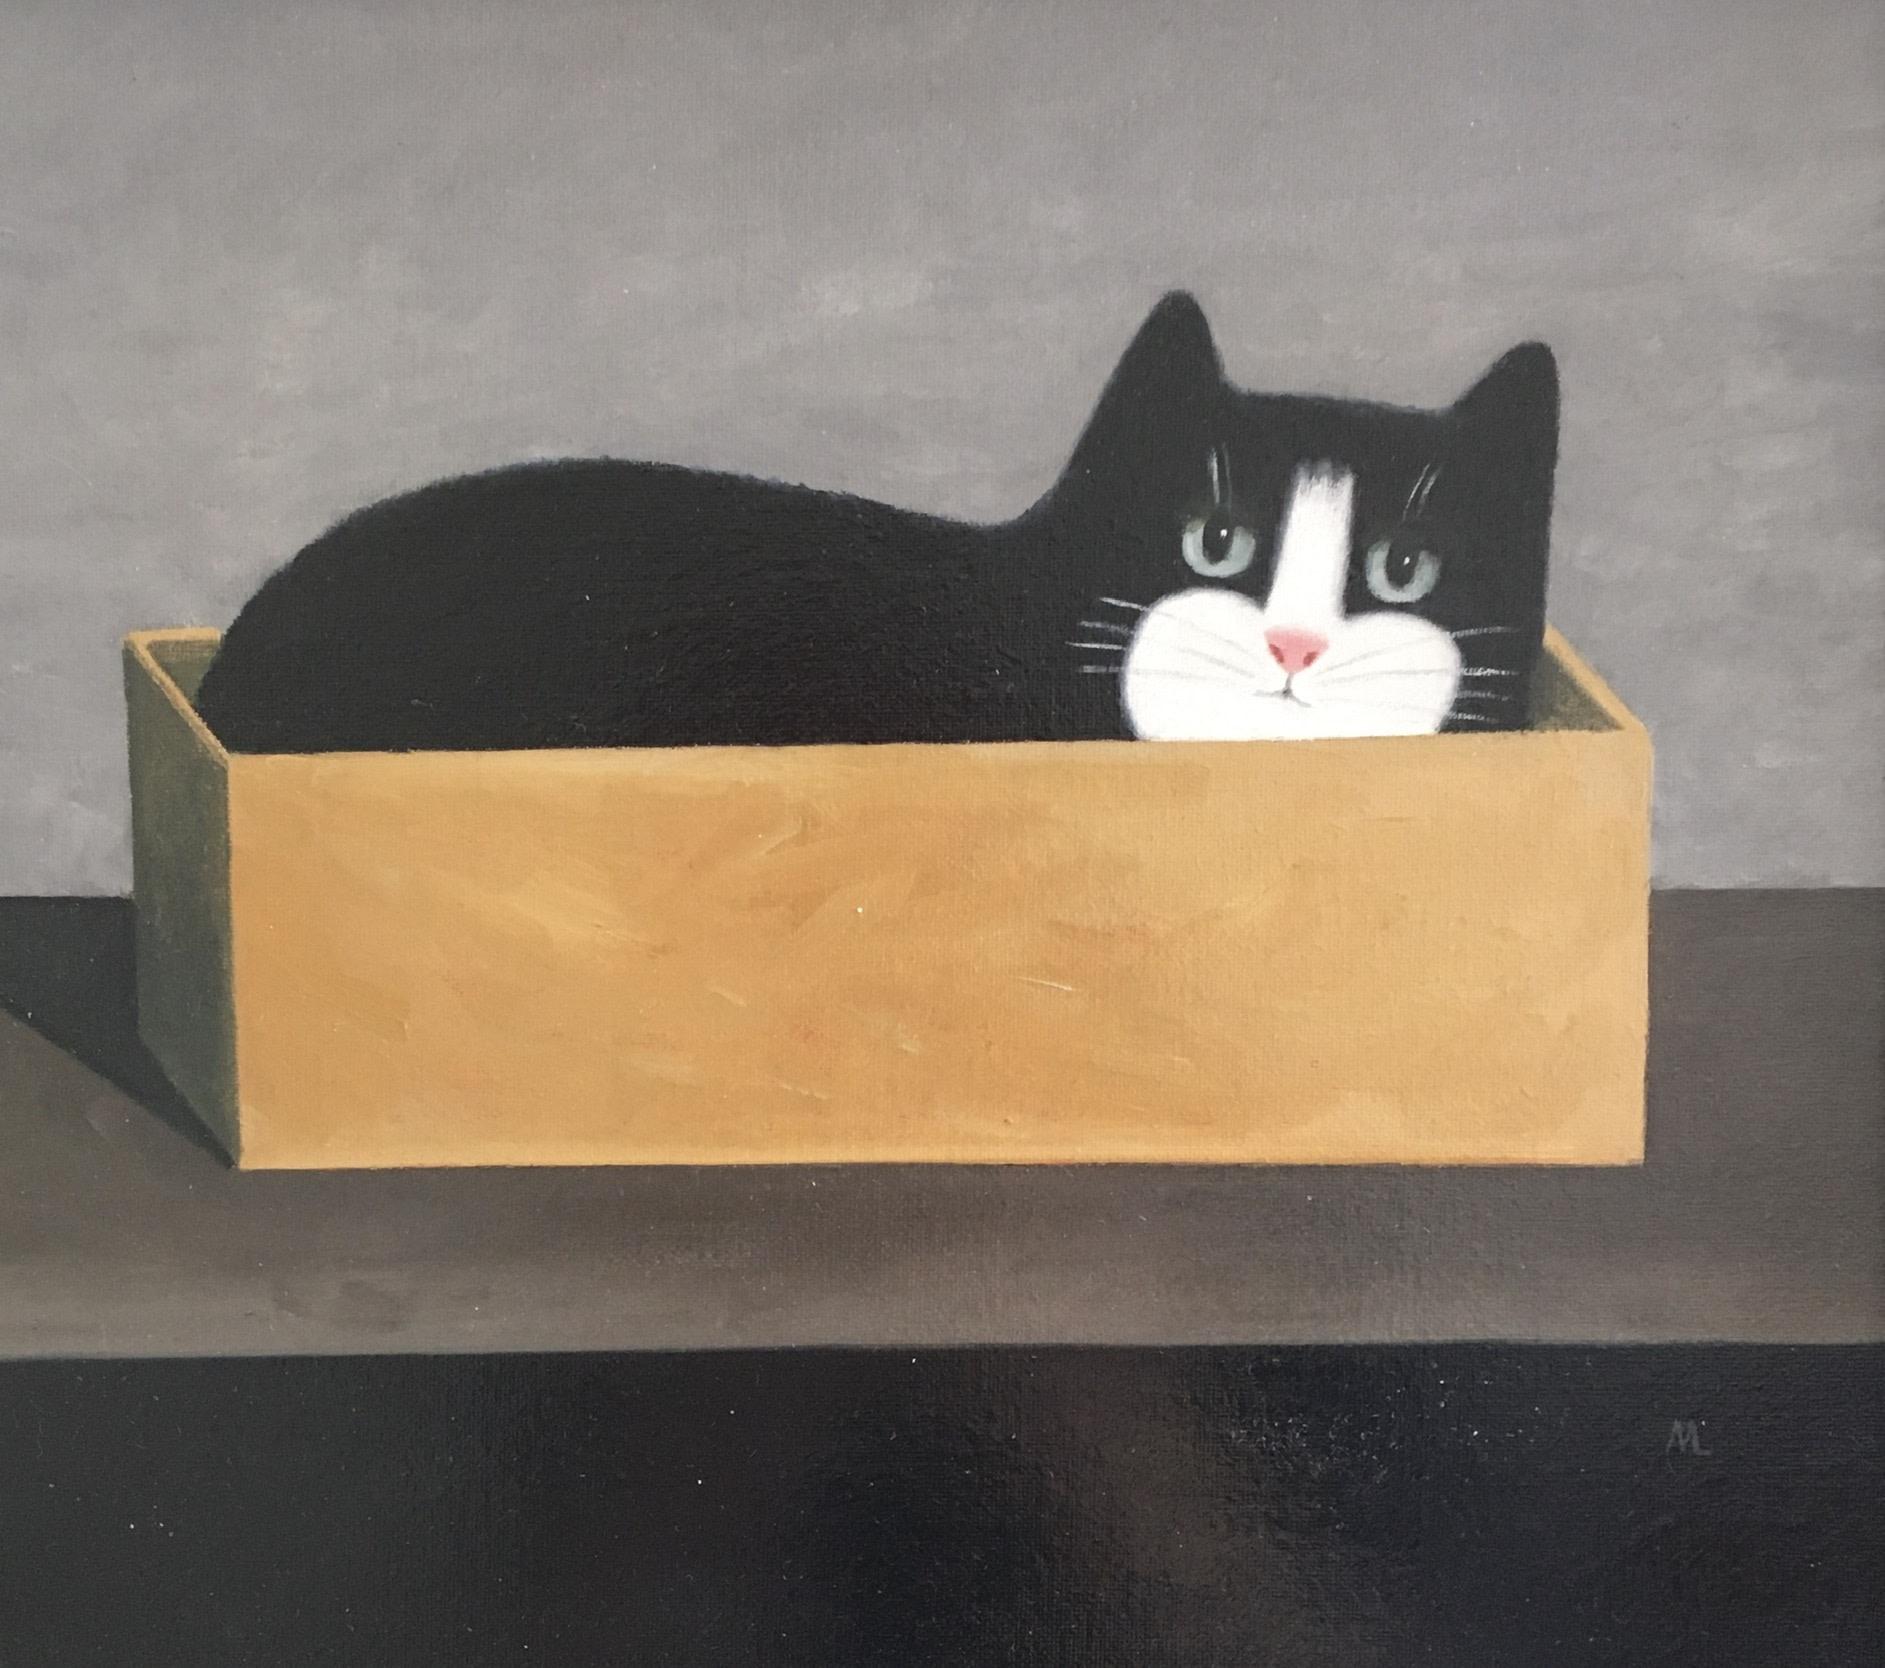 "<span class=""link fancybox-details-link""><a href=""/artists/78-martin-leman/works/12400-martin-leman-cat-in-the-box/"">View Detail Page</a></span><div class=""artist""><span class=""artist""><strong>Martin Leman</strong></span></div><div class=""title""><em>Cat in the Box</em></div><div class=""medium"">oil on board</div><div class=""dimensions"">Frame: 38 x 40 cm<br /> Artwork: 23 x 26 cm</div><div class=""price"">£1,200.00</div>"